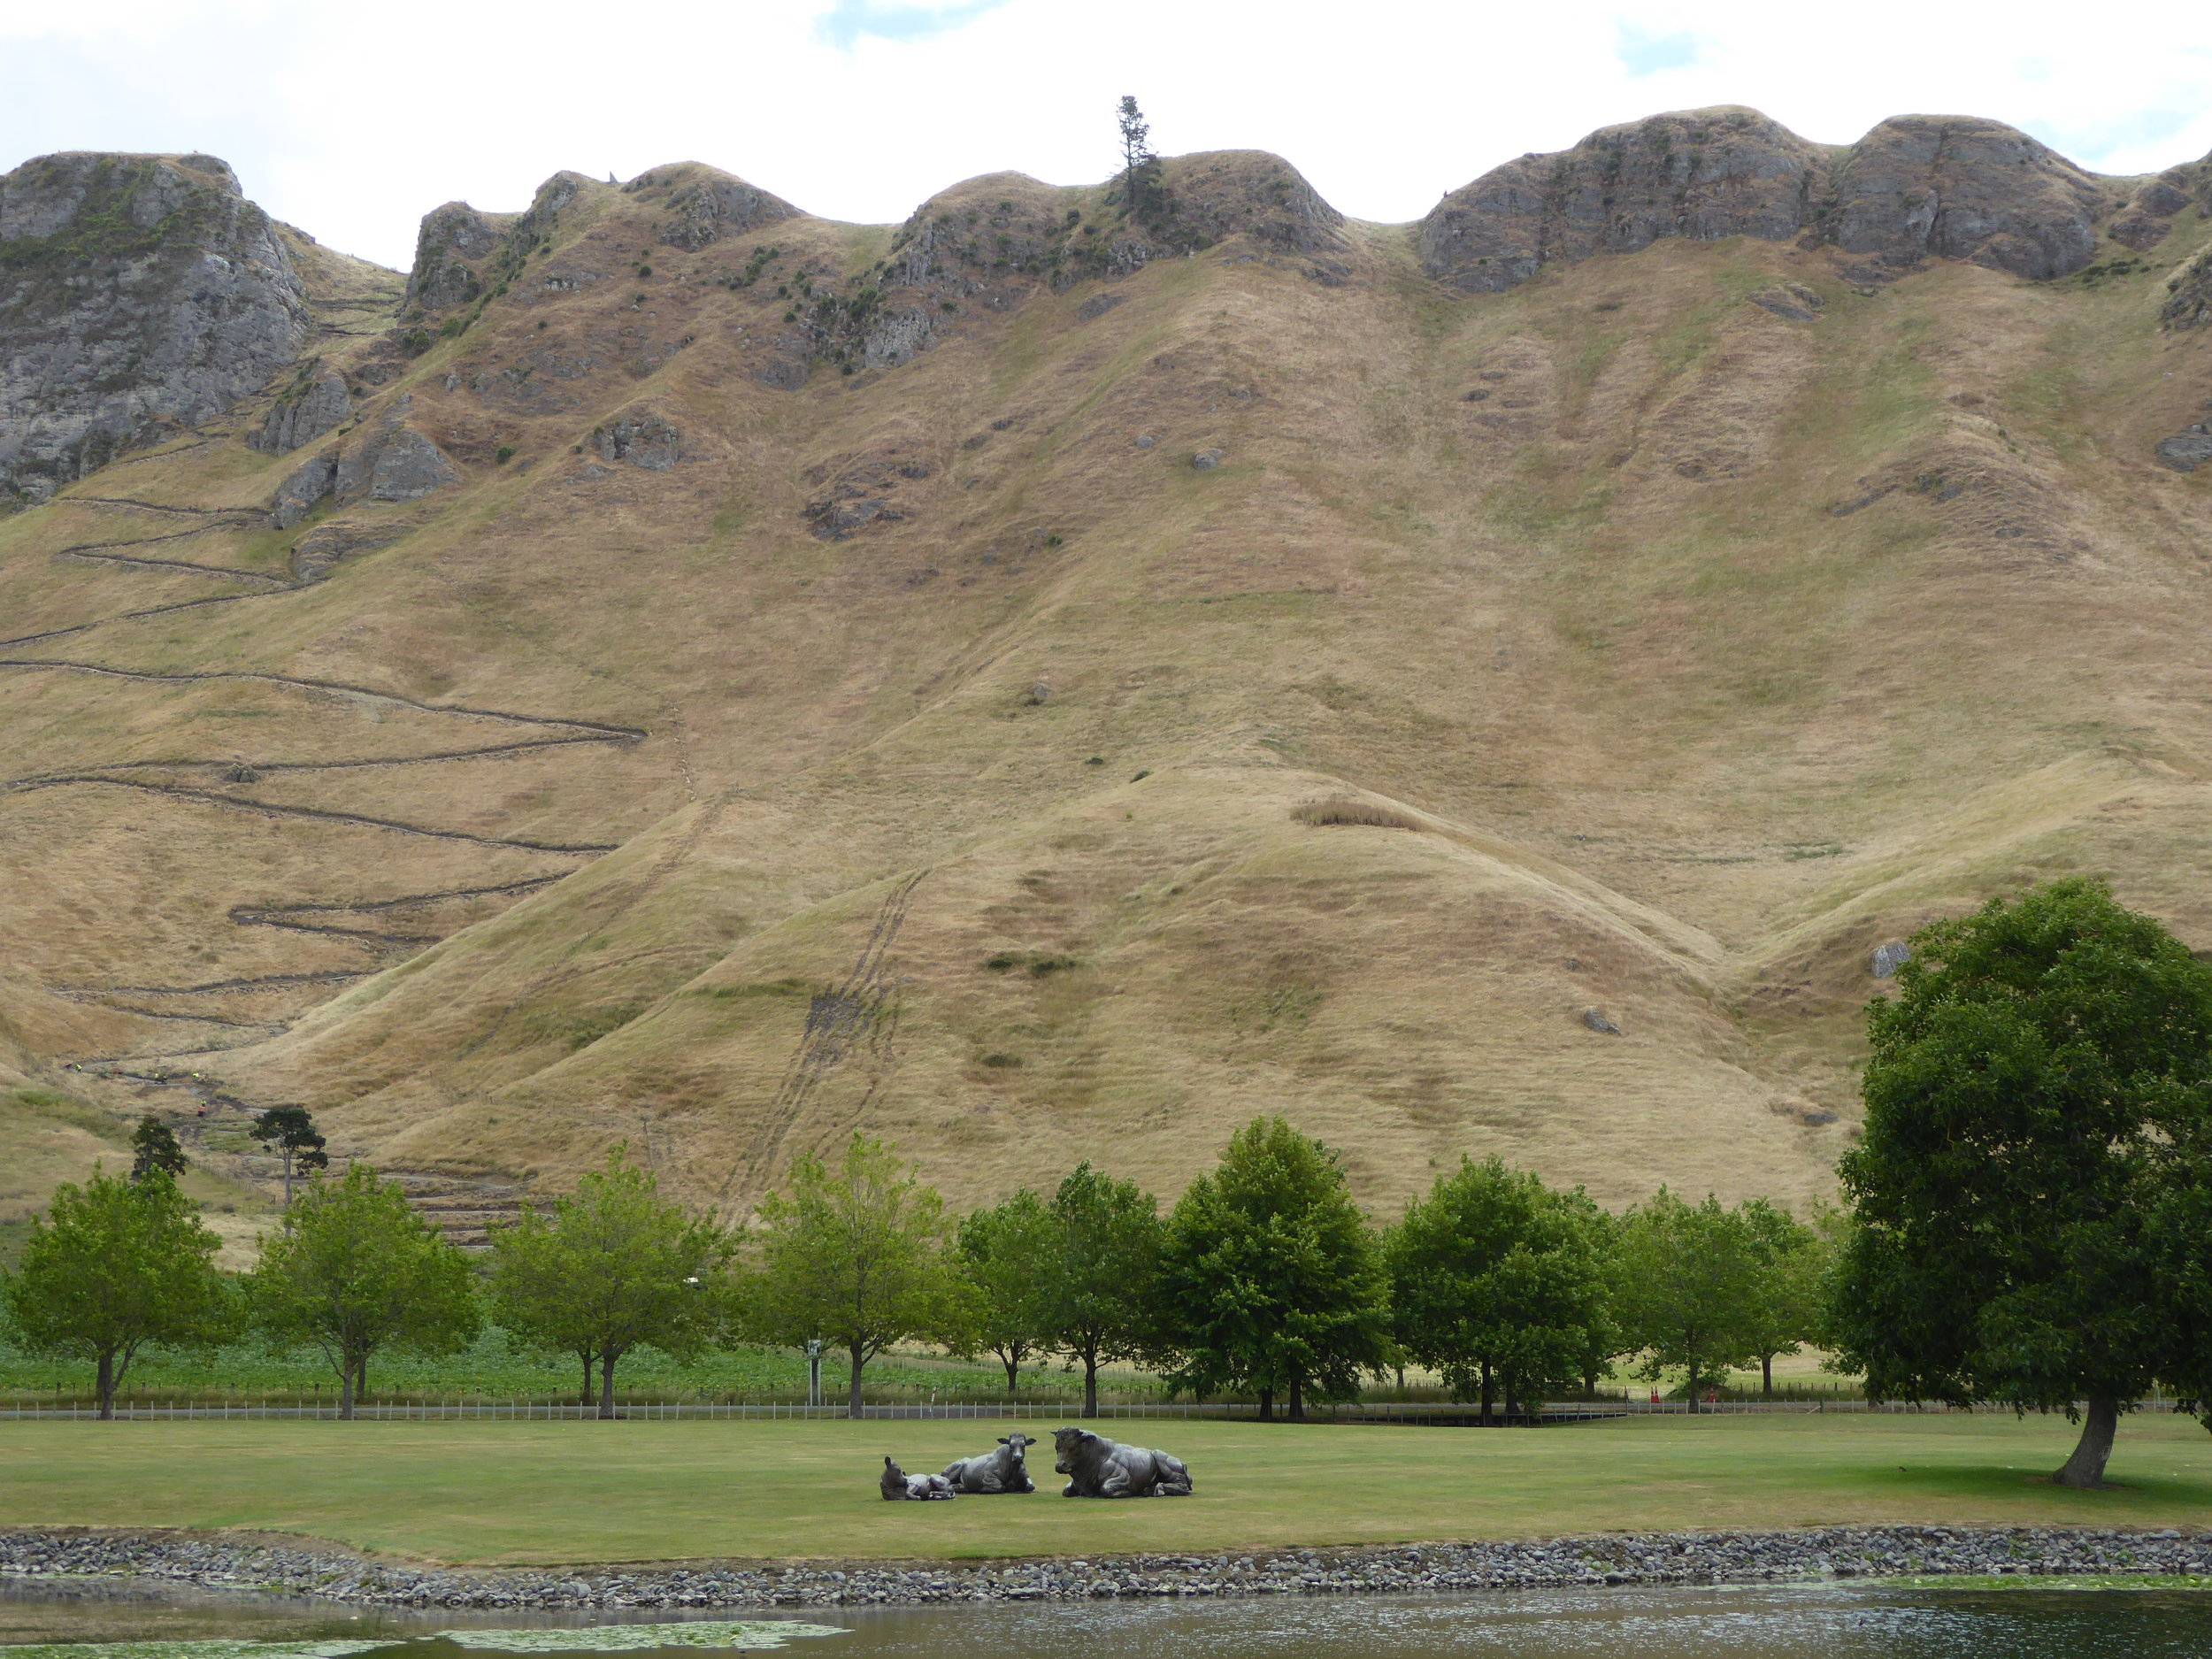 Post card like views of the sacred mountain